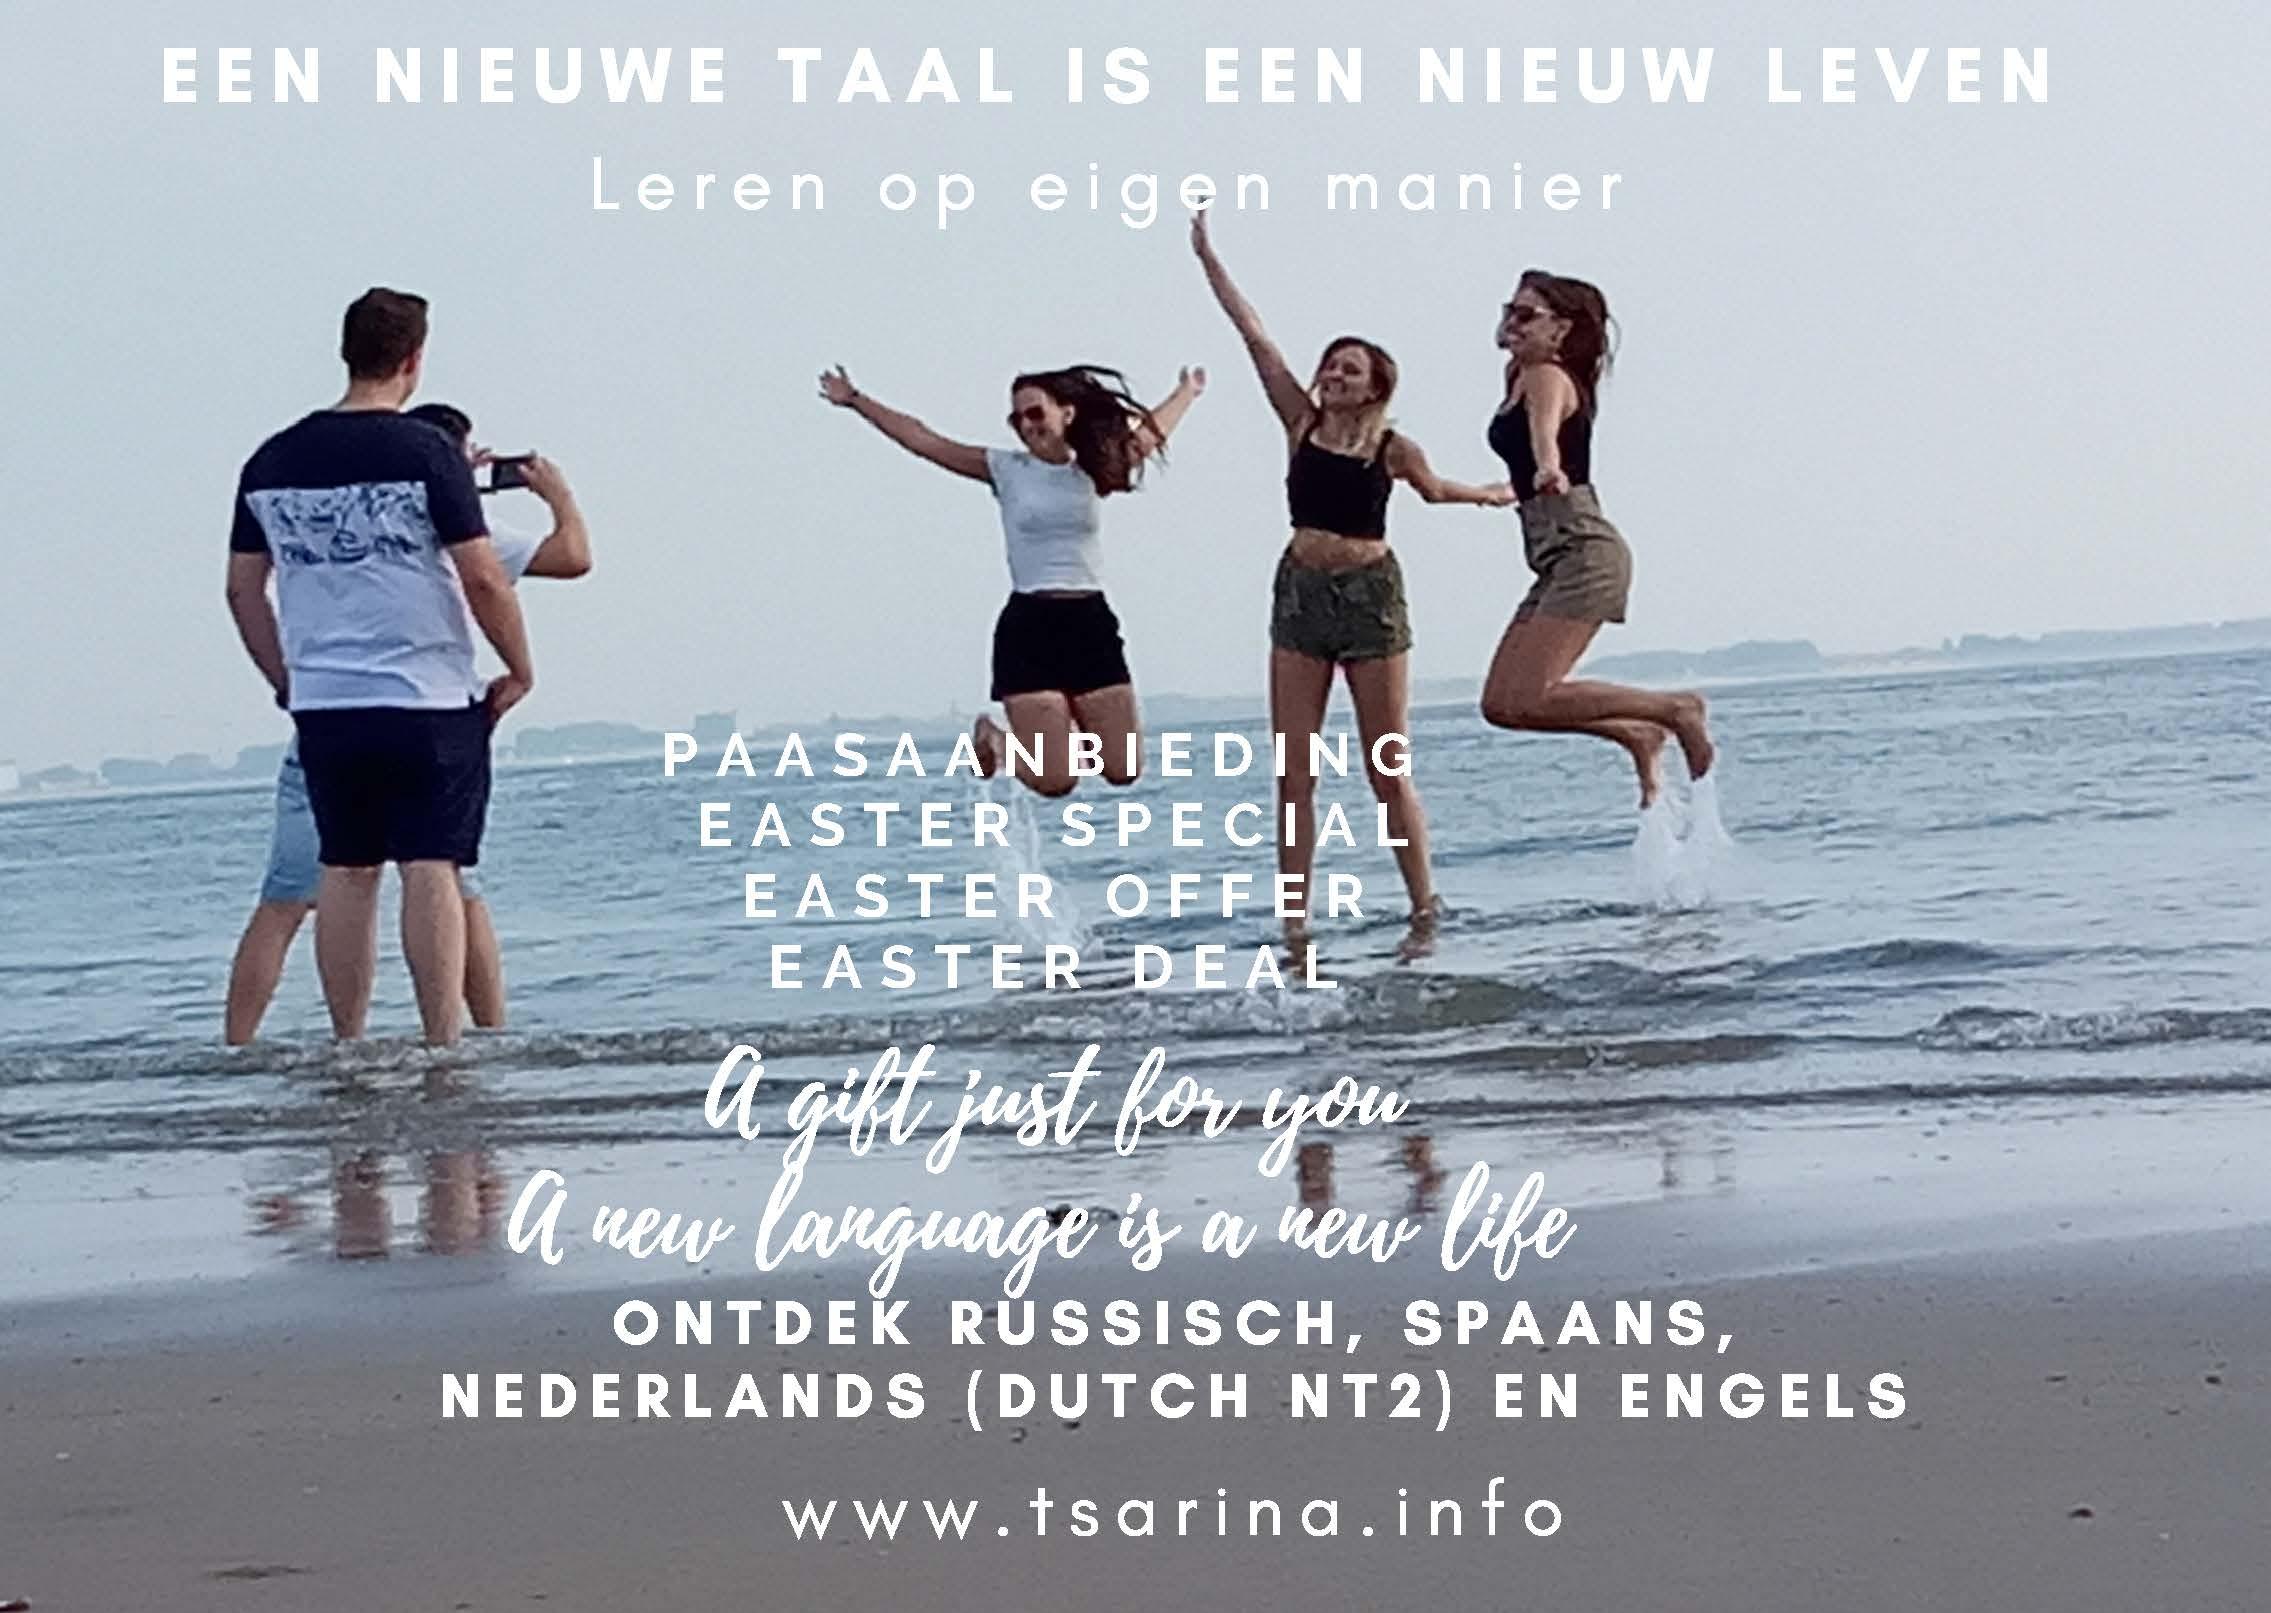 Russisch Nederlands Dutch NT2 Engels Spaans cursus taalles languagelearning